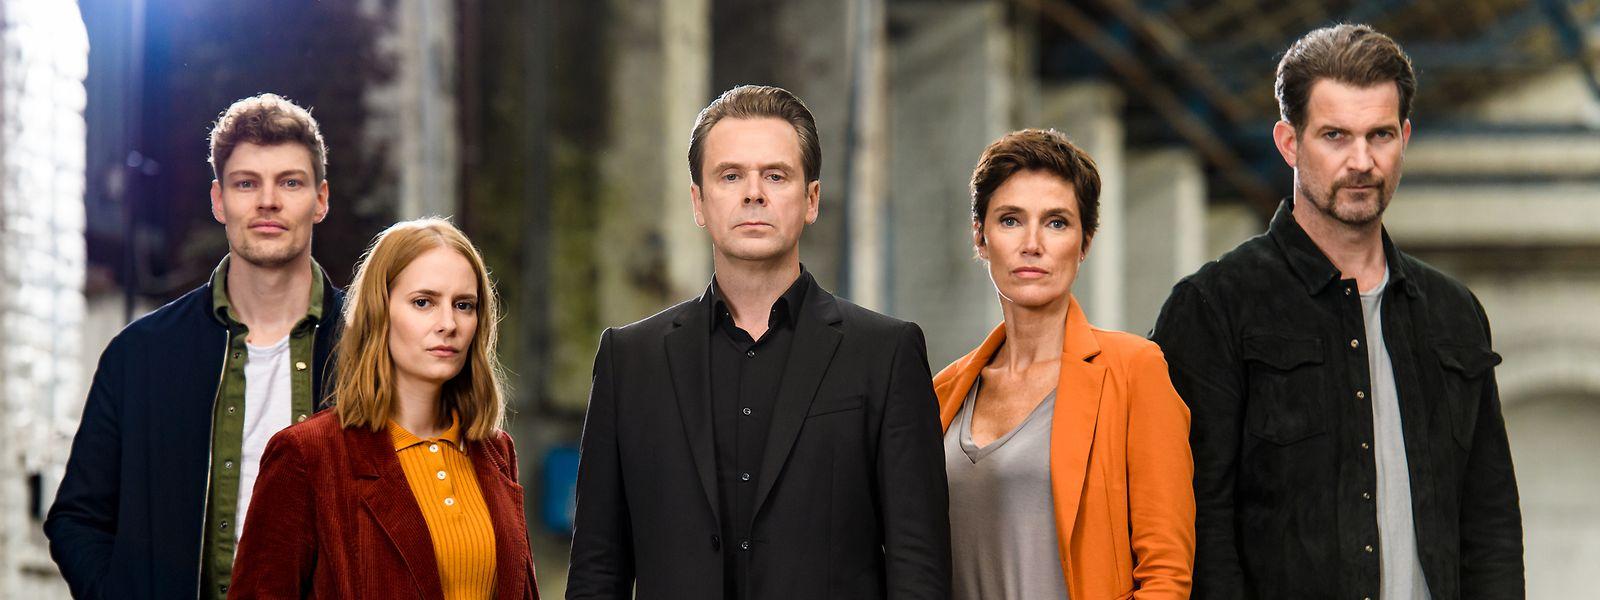 Von links: Daniel Winter (Helgi Schmid), Greta Lindbergh (Cornelia Ivancan), Professor T. (Matthias Matschke), Christina Fehrmann (Julia Bremermann), Simon Zander (Simon Böer).